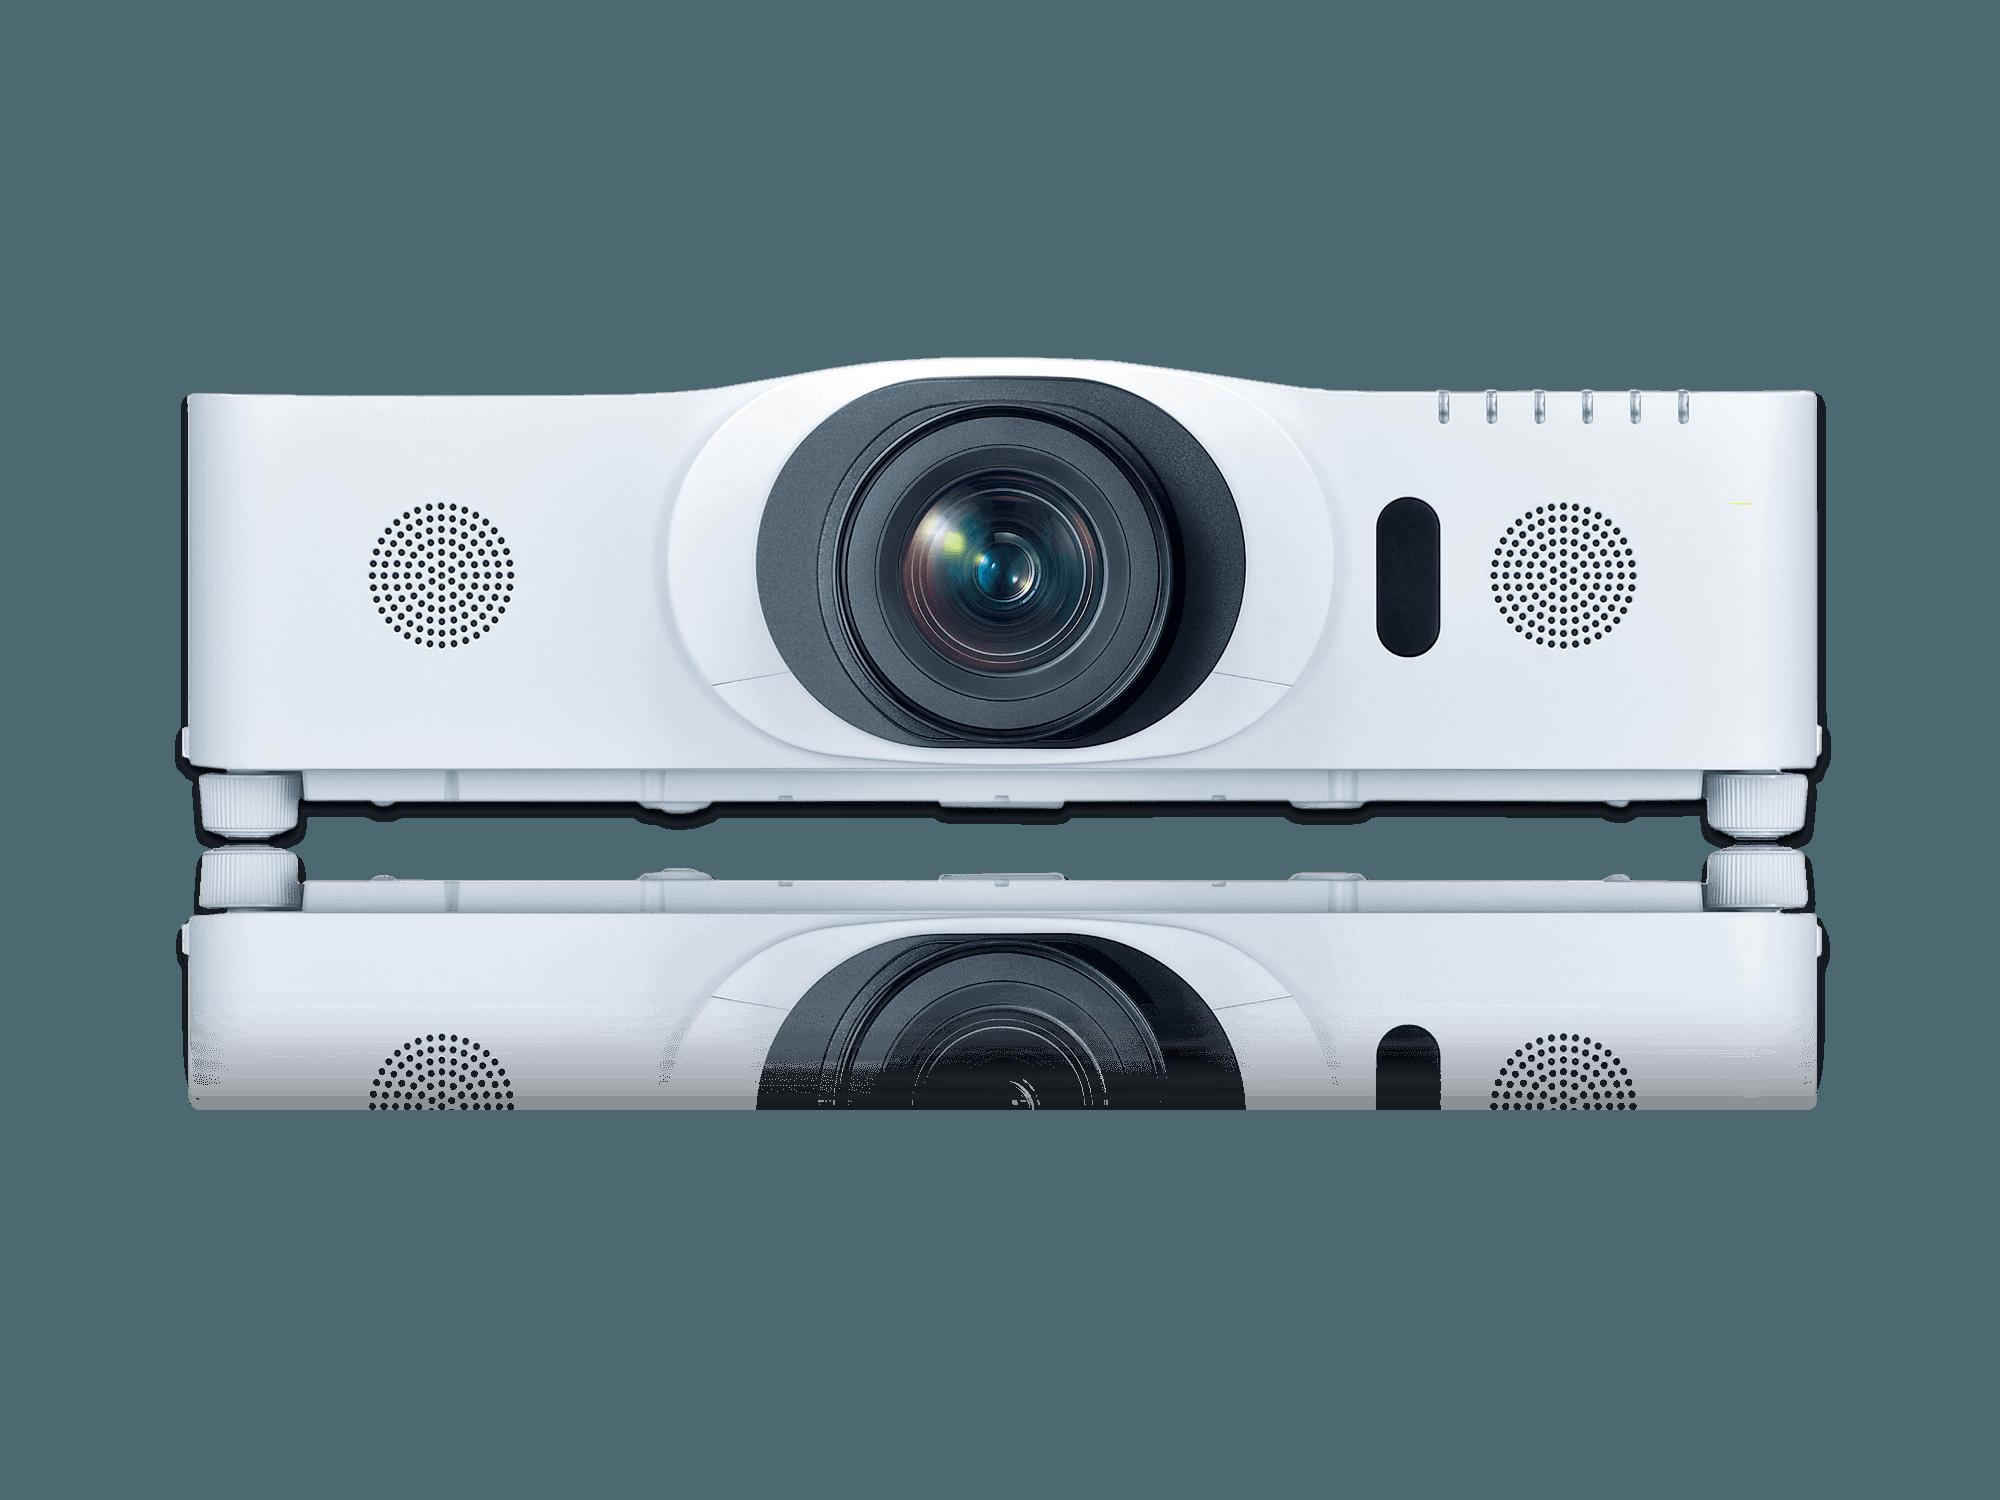 Maxell MC-WU8461 WUXGA 6000lm LCD Installation Projector